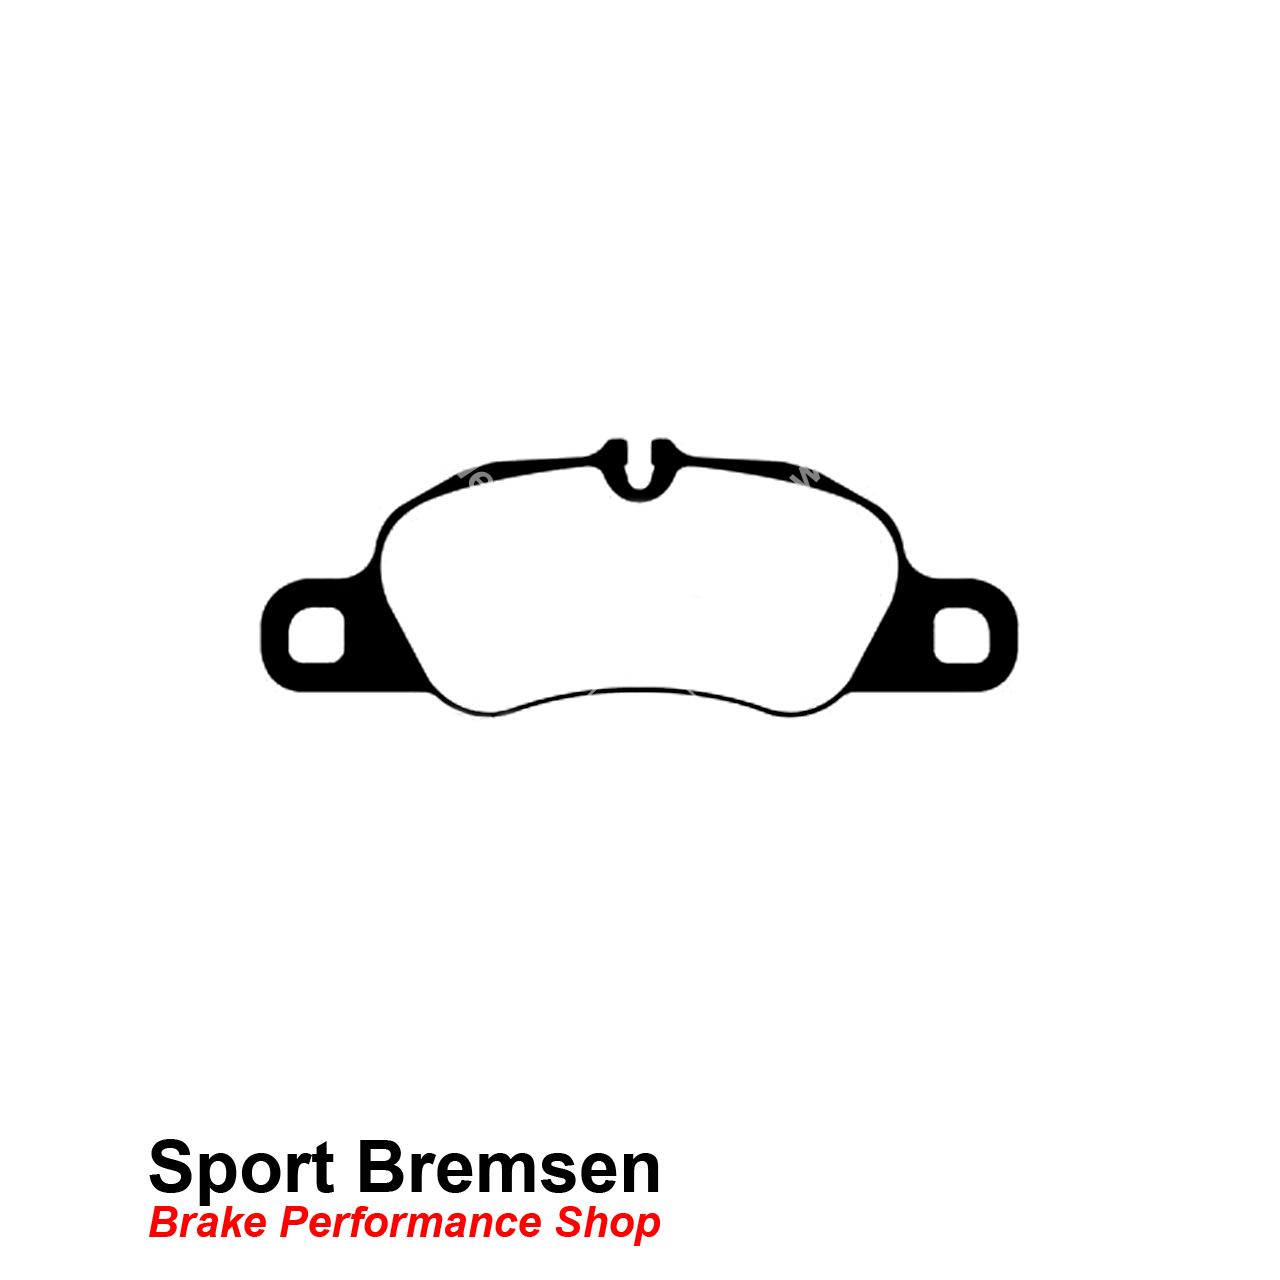 Ebc Yellowstuff Bremsbelage Fur Porsche Boxster 981 3 4